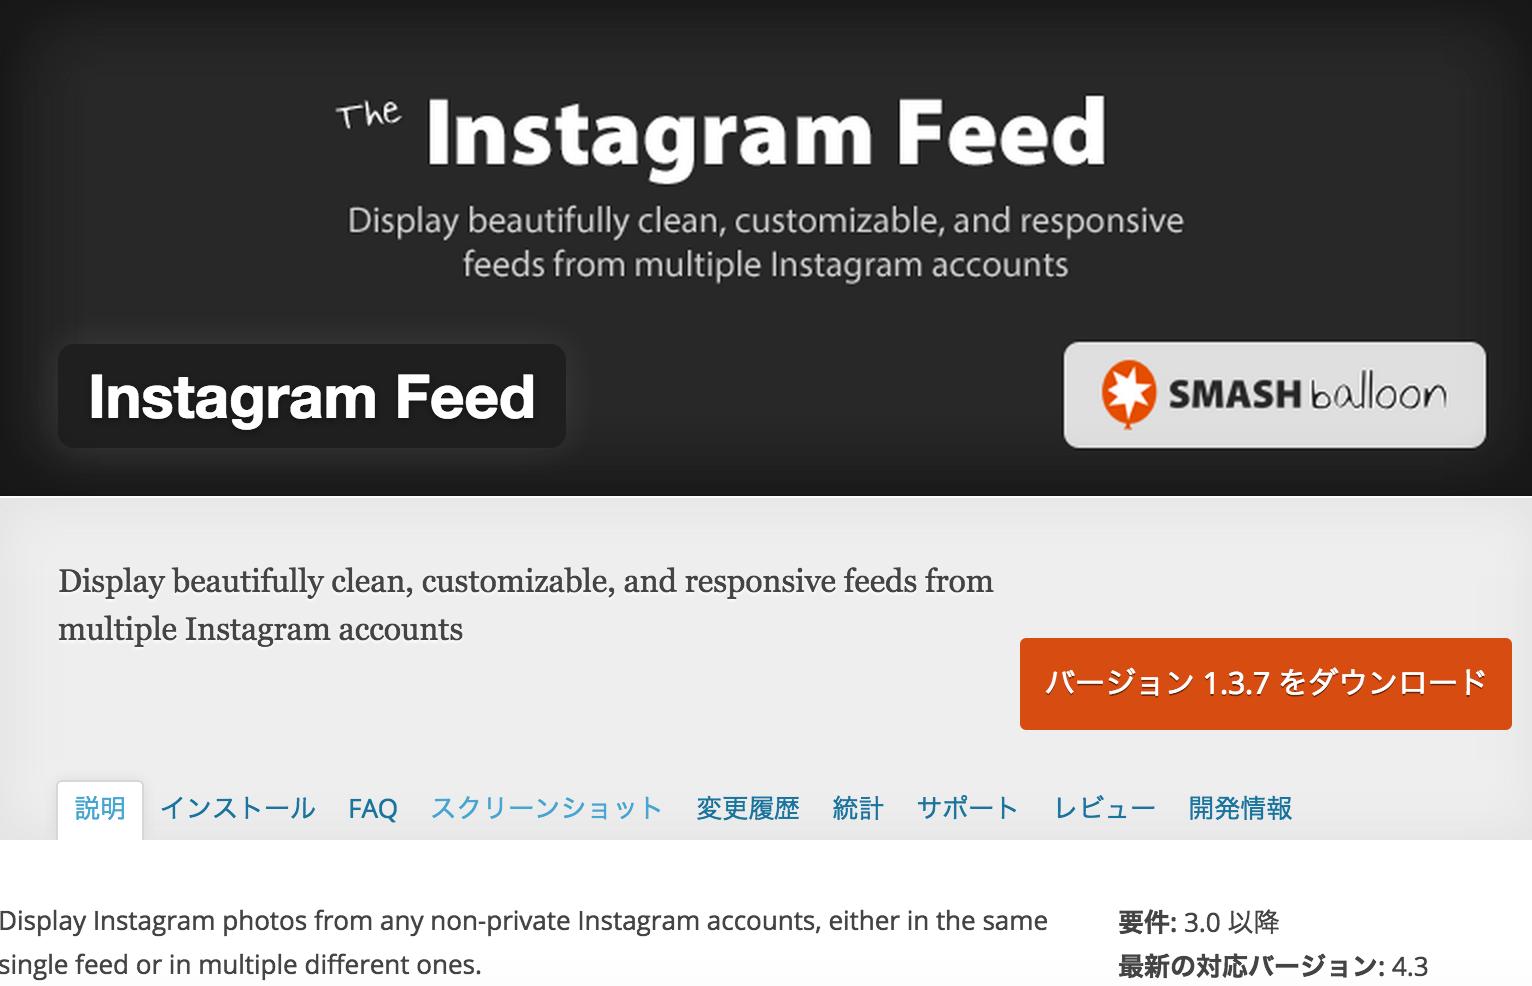 instagramfeedplugins